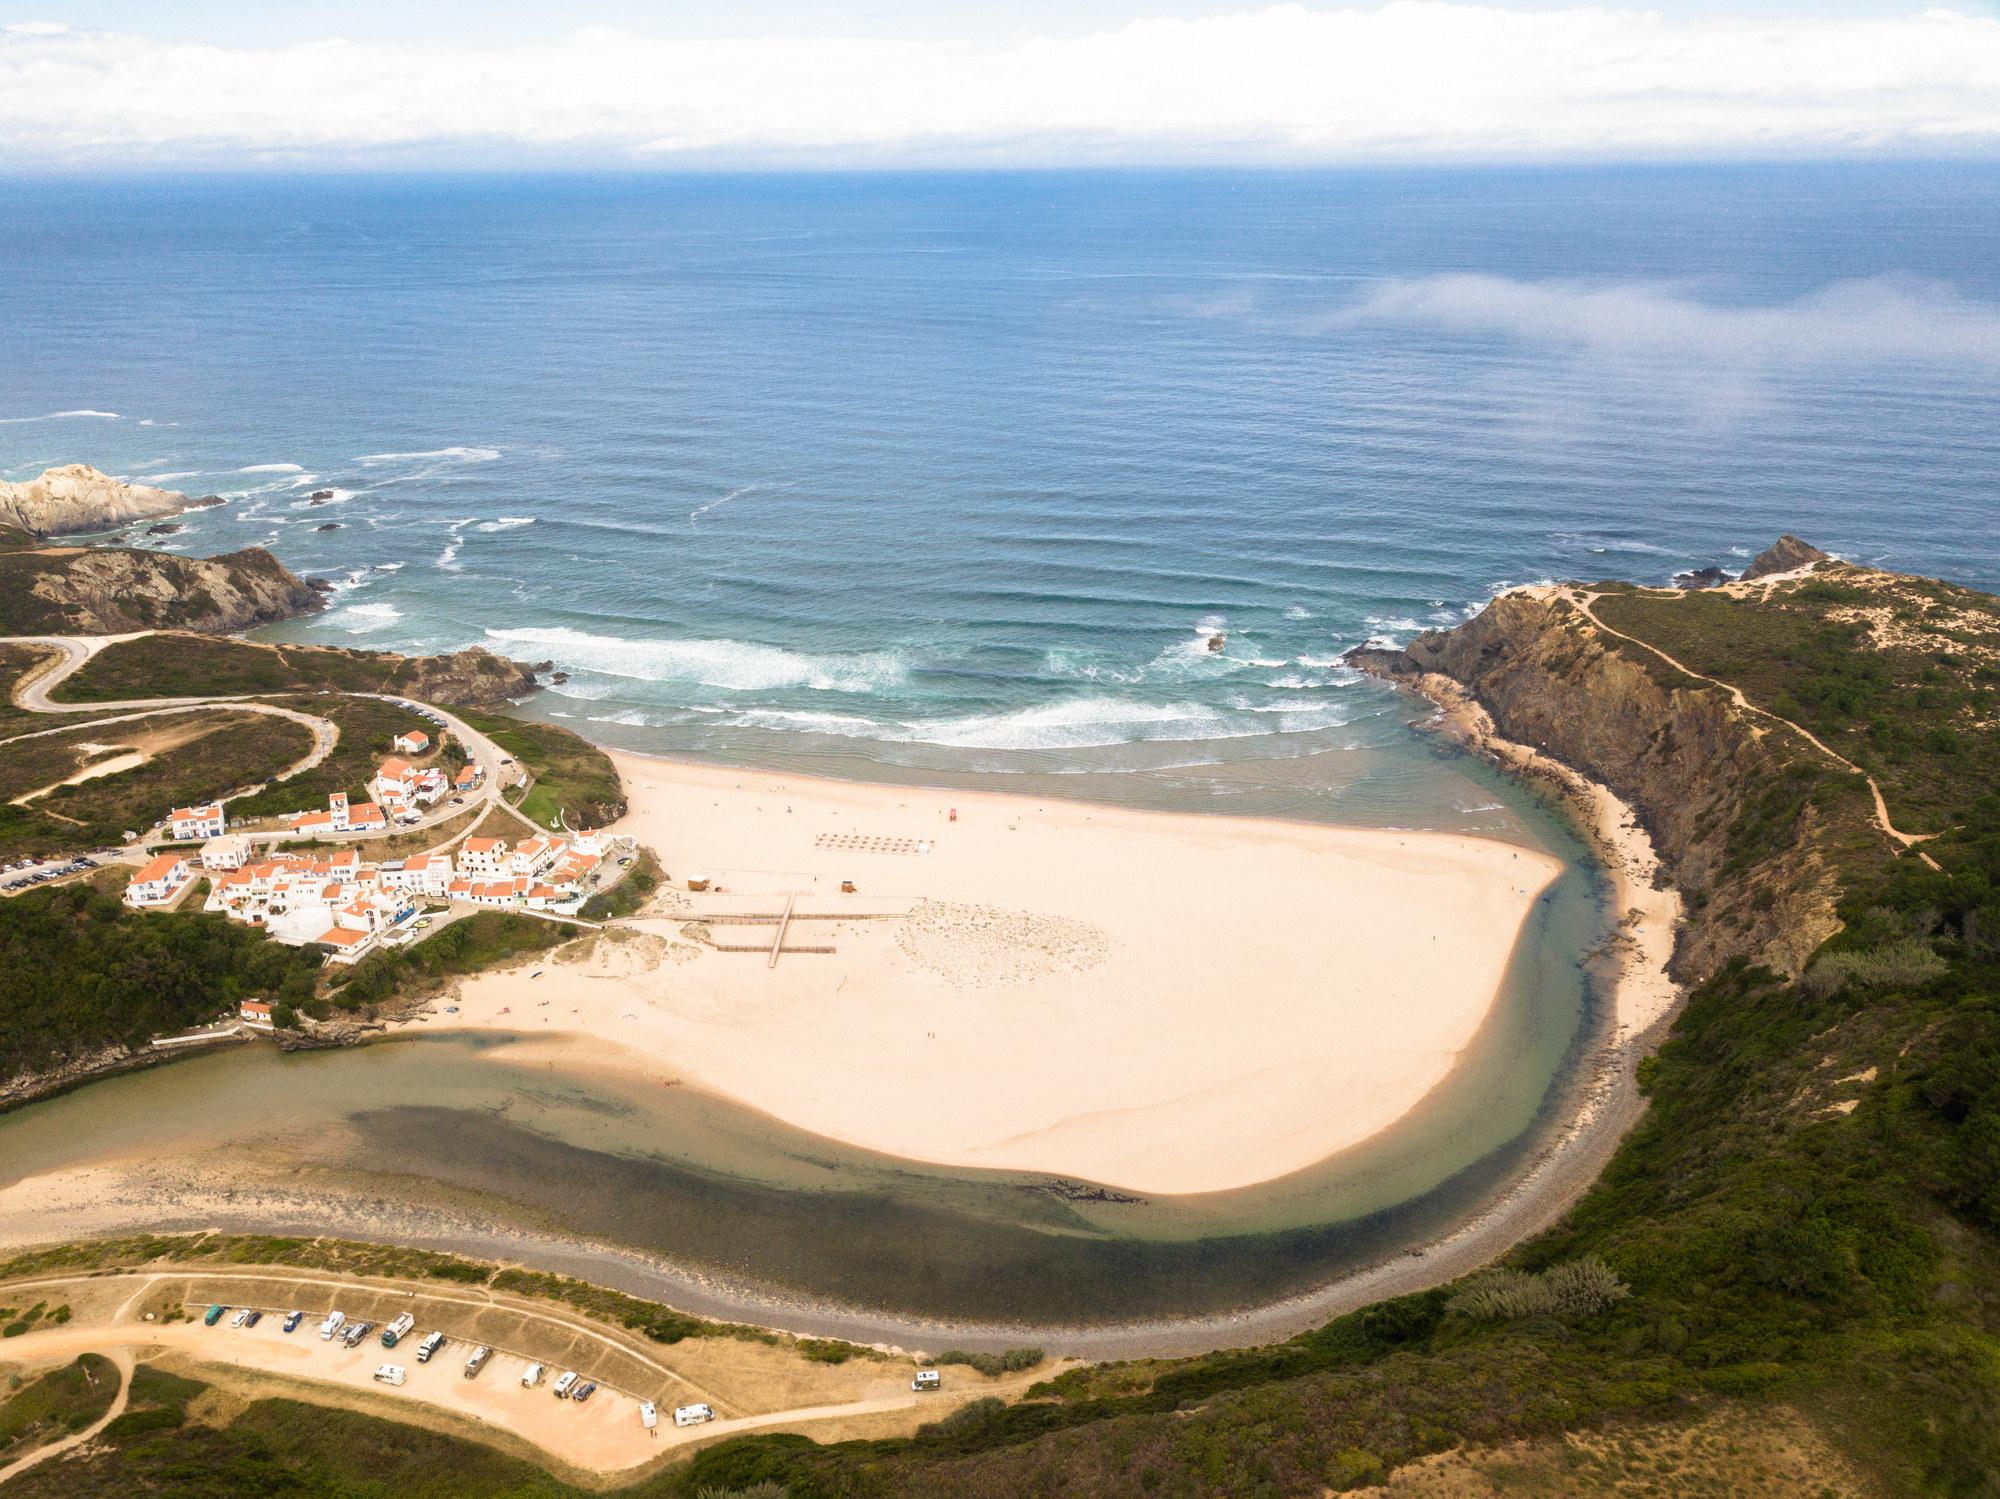 Praia de Odeceixe in Aljezur, Portugal.